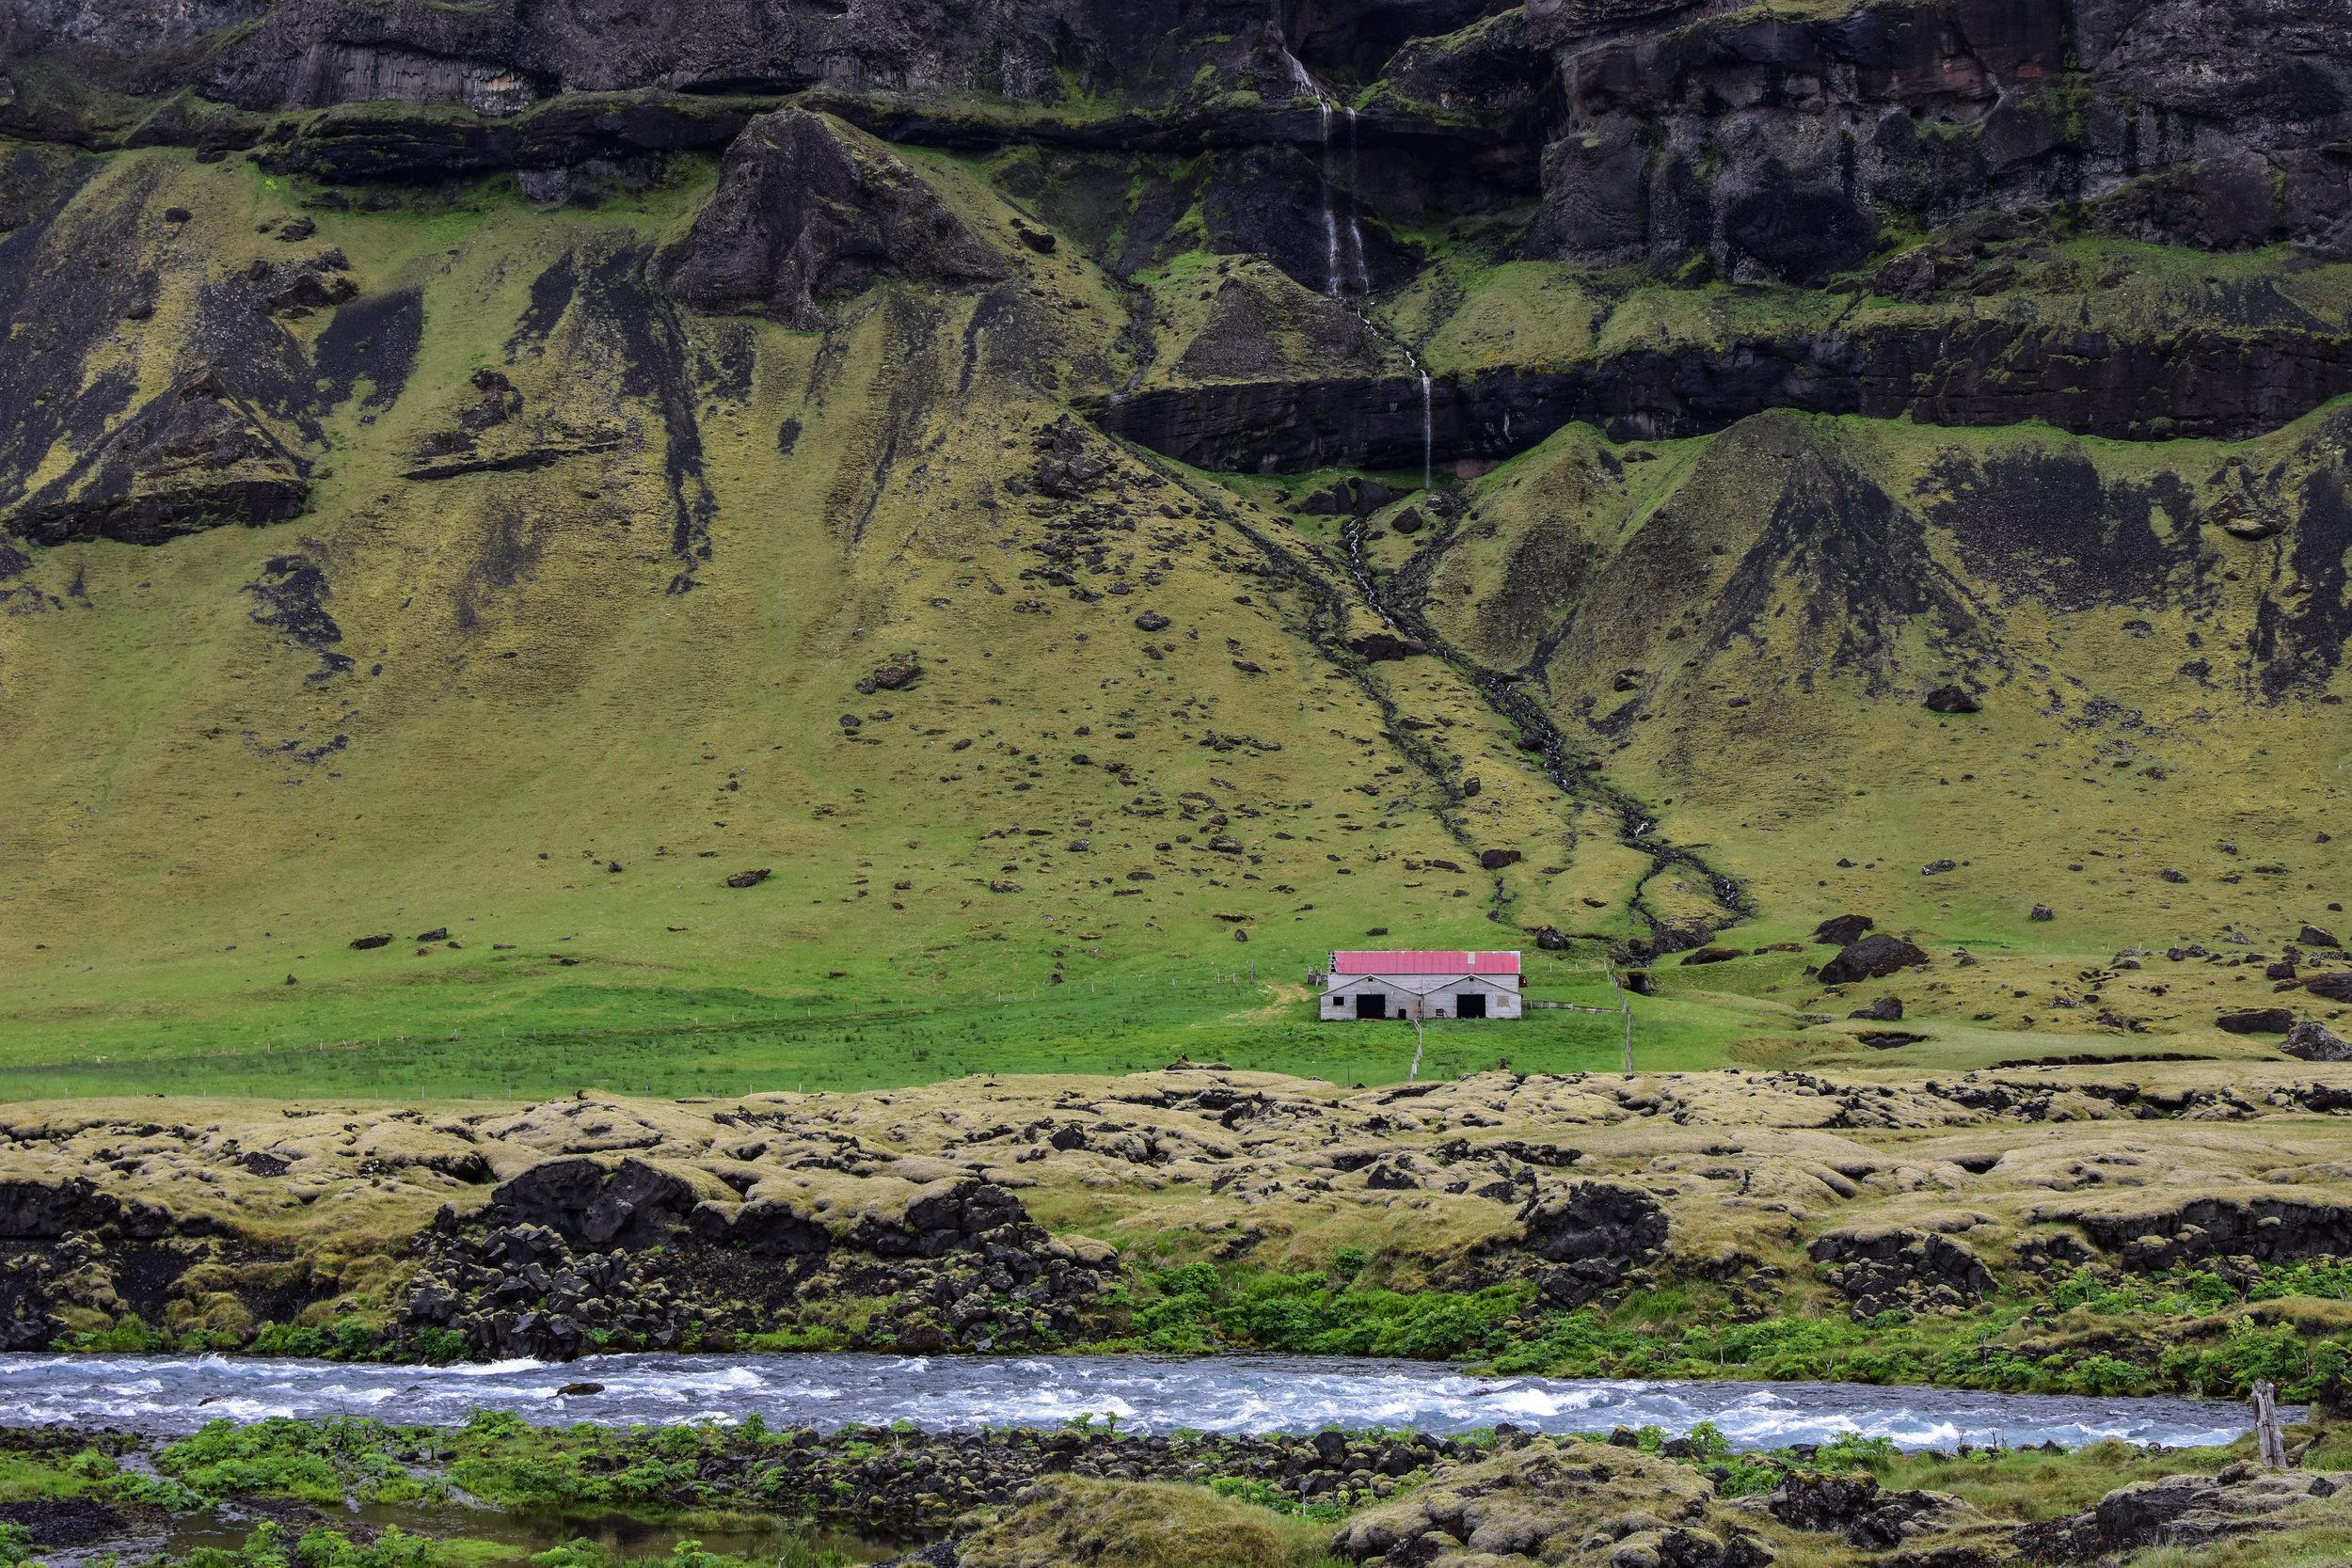 Small Farm House on the South Coast of Iceland